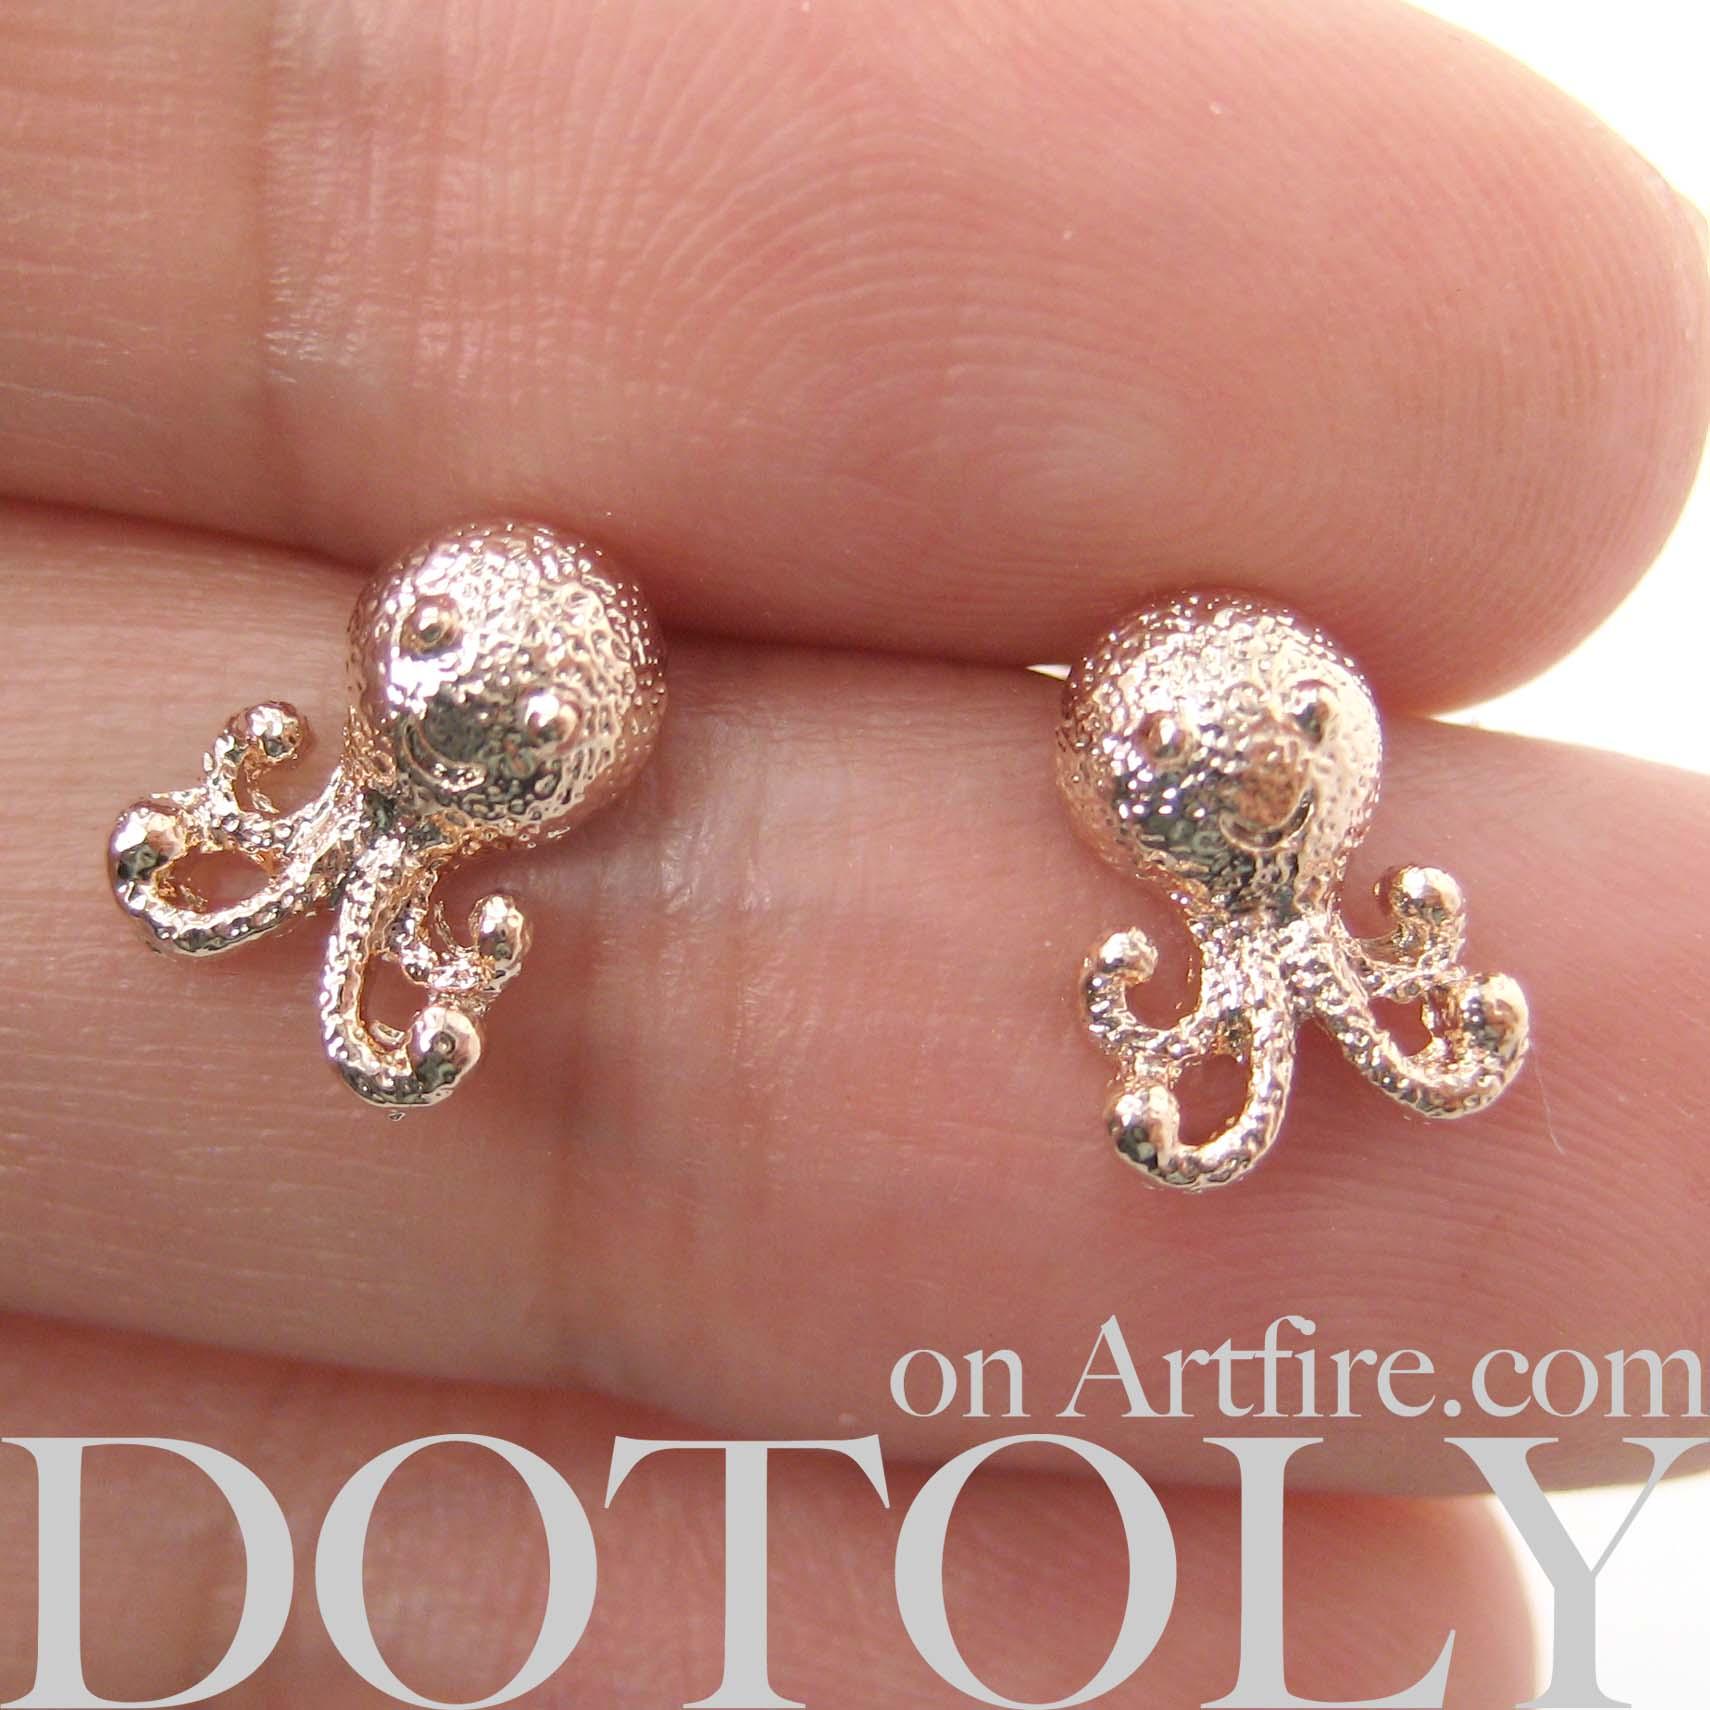 Dotoly Plus | Small Cute Octopus Squid Sea Animal Stud Earrings in ...